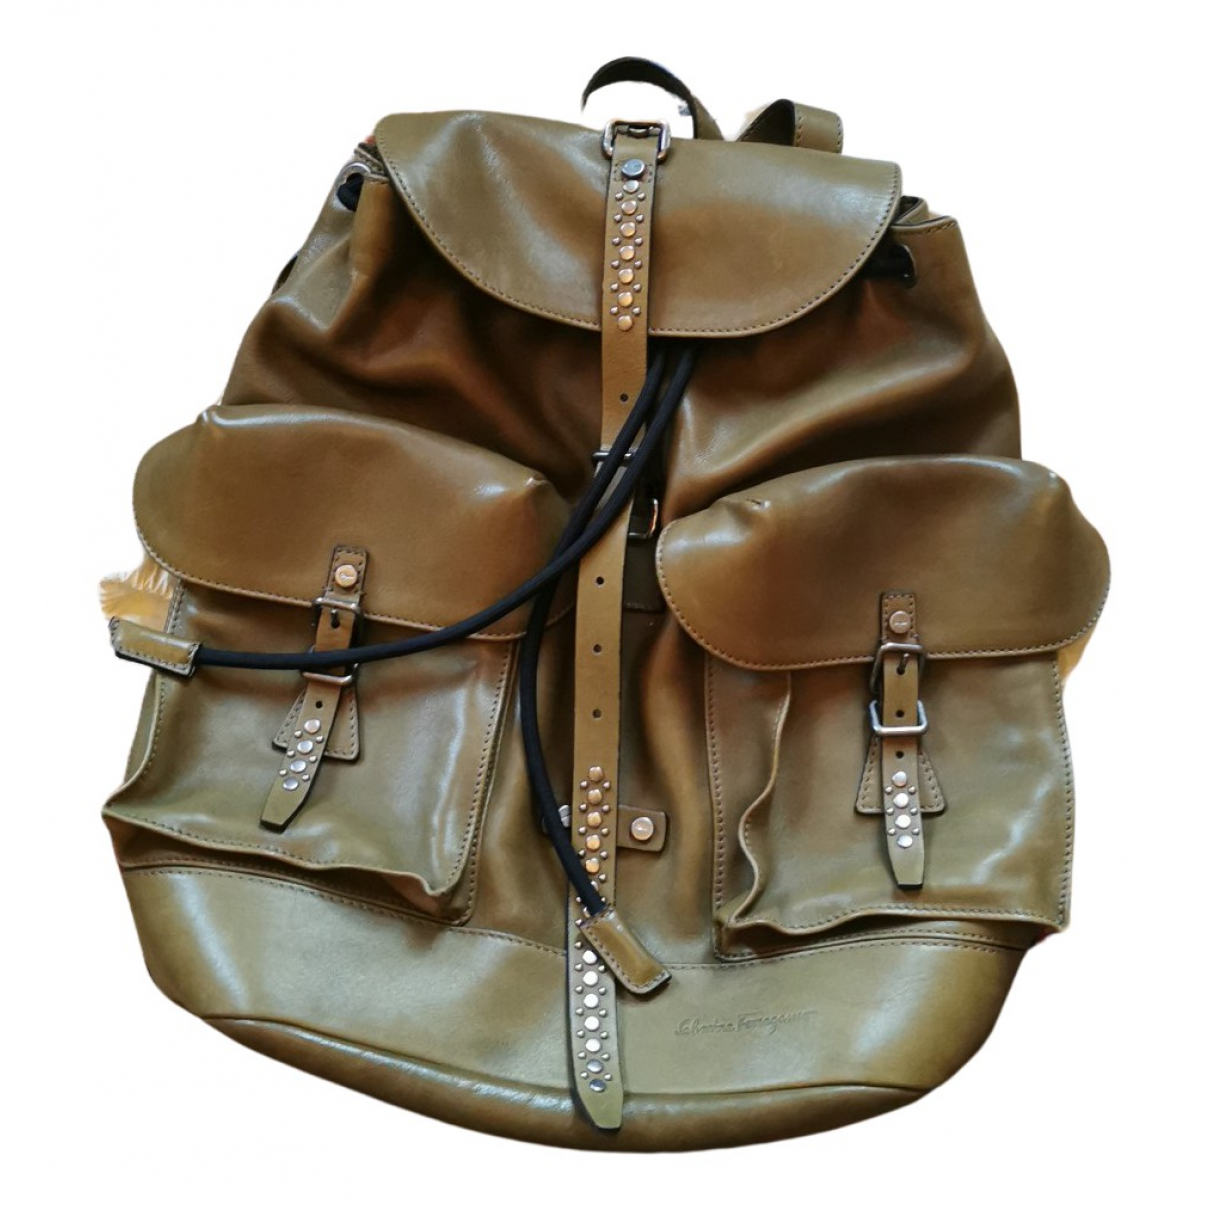 Salvatore Ferragamo N Khaki Leather bag for Men N